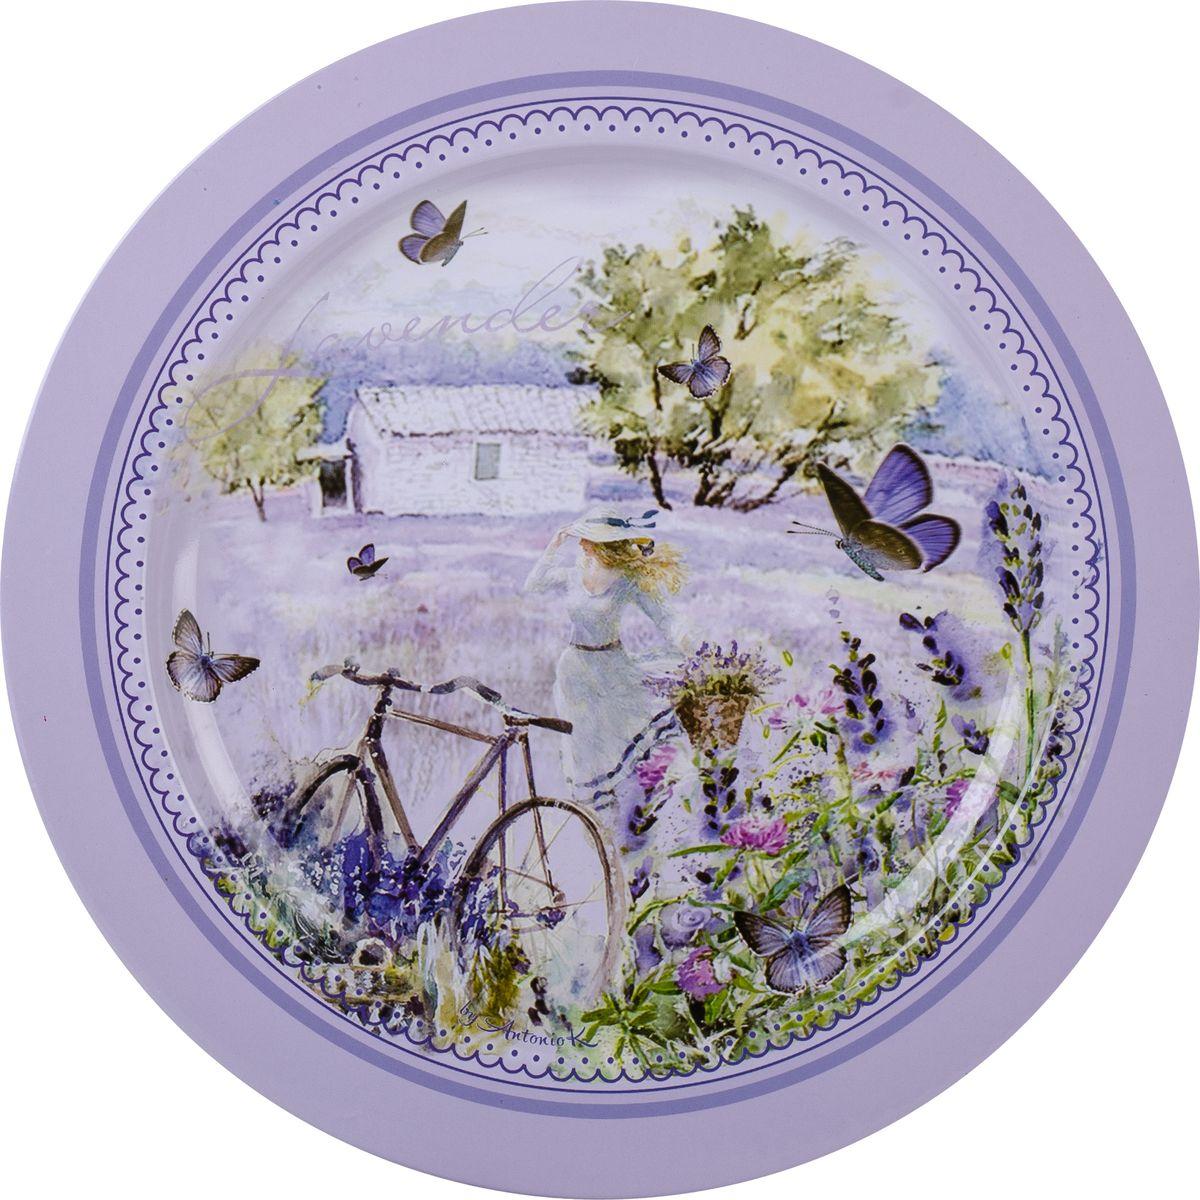 Поднос Gift'n'Home Лаванда, диаметр 25 см поднос круглый альтернатива изобилие диаметр 35 см